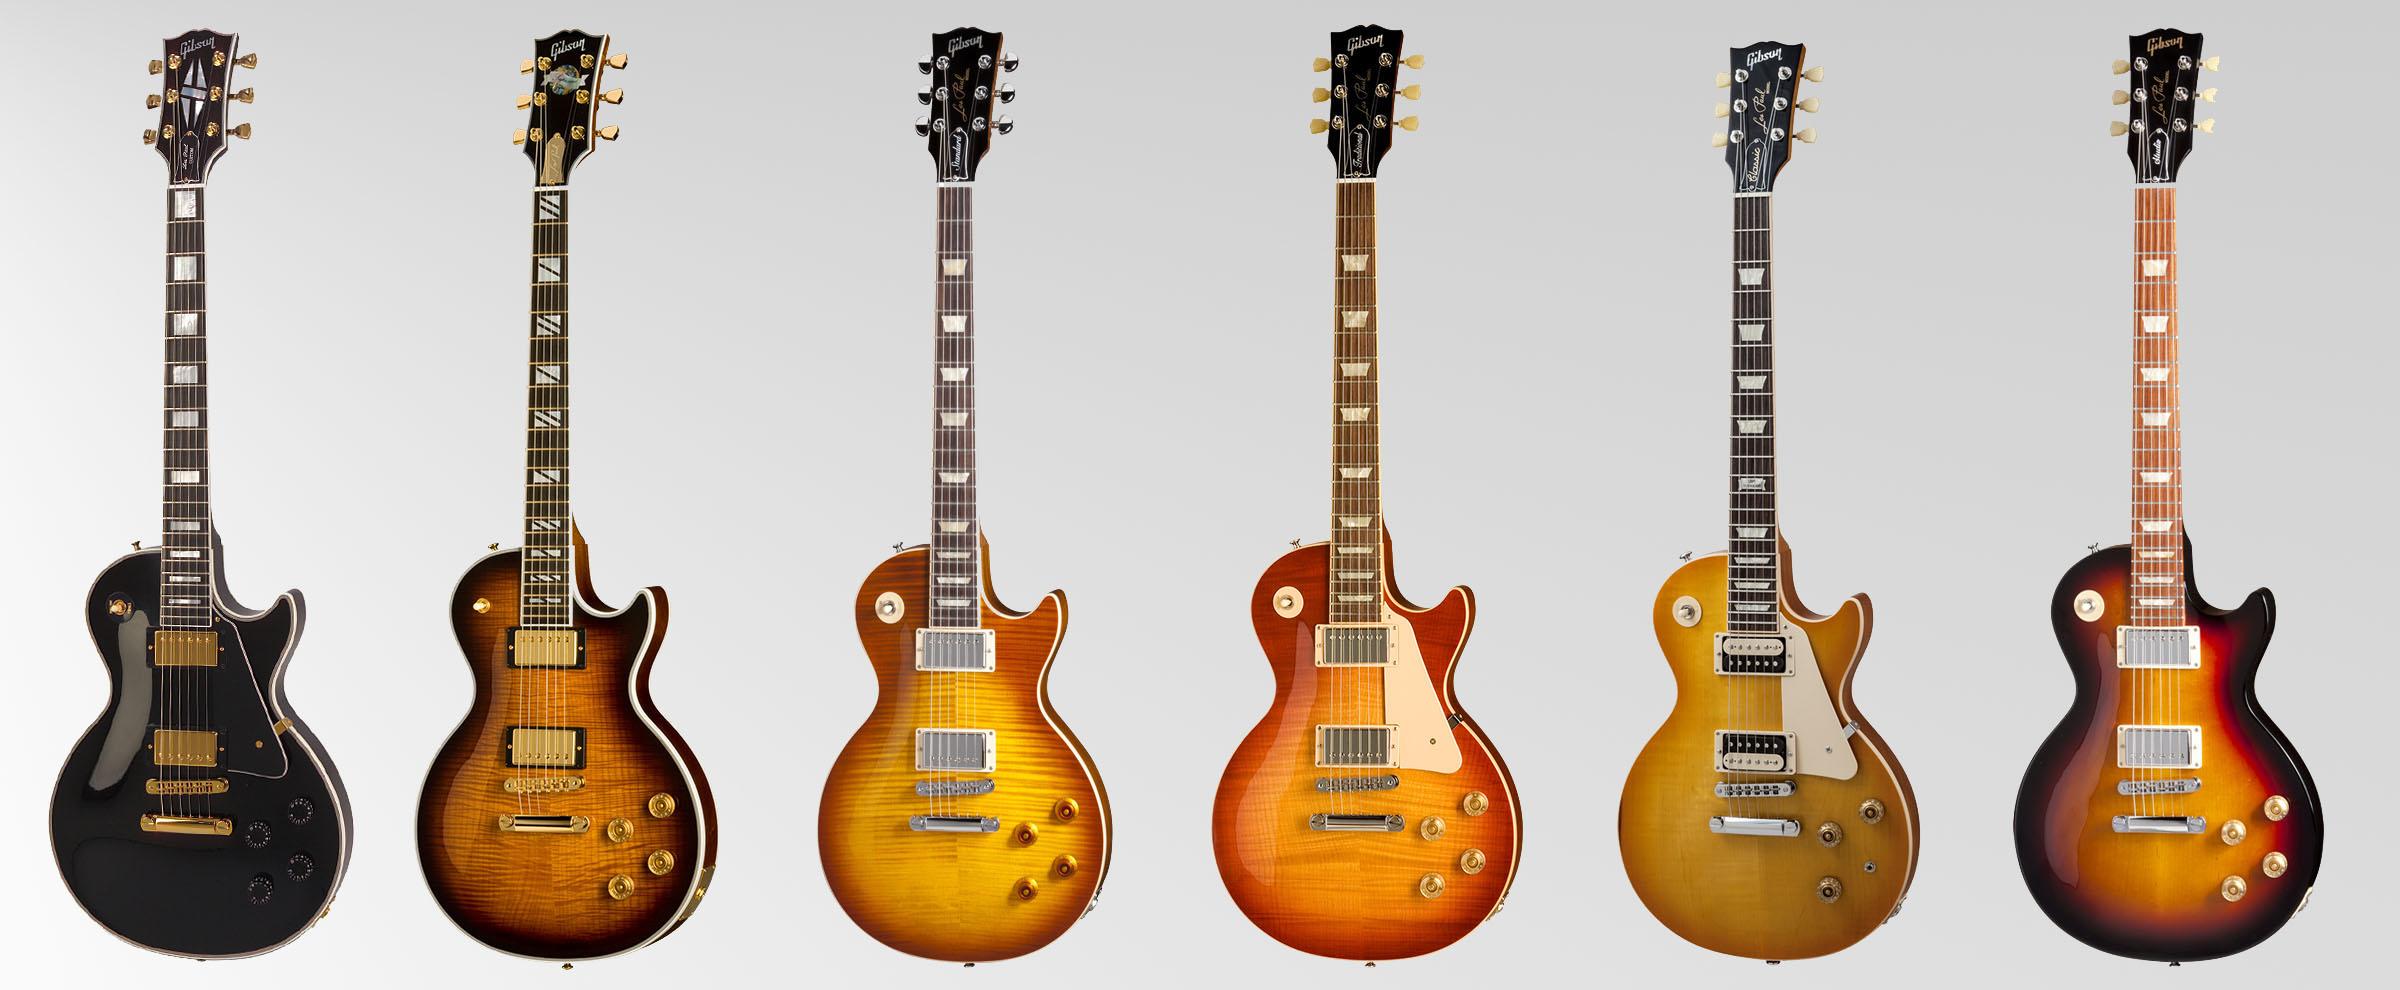 Gibson Guitars 1958 Les Paul Wiring Diagram Guitar Line Custom Supreme Standard Traditional Classic And Studio